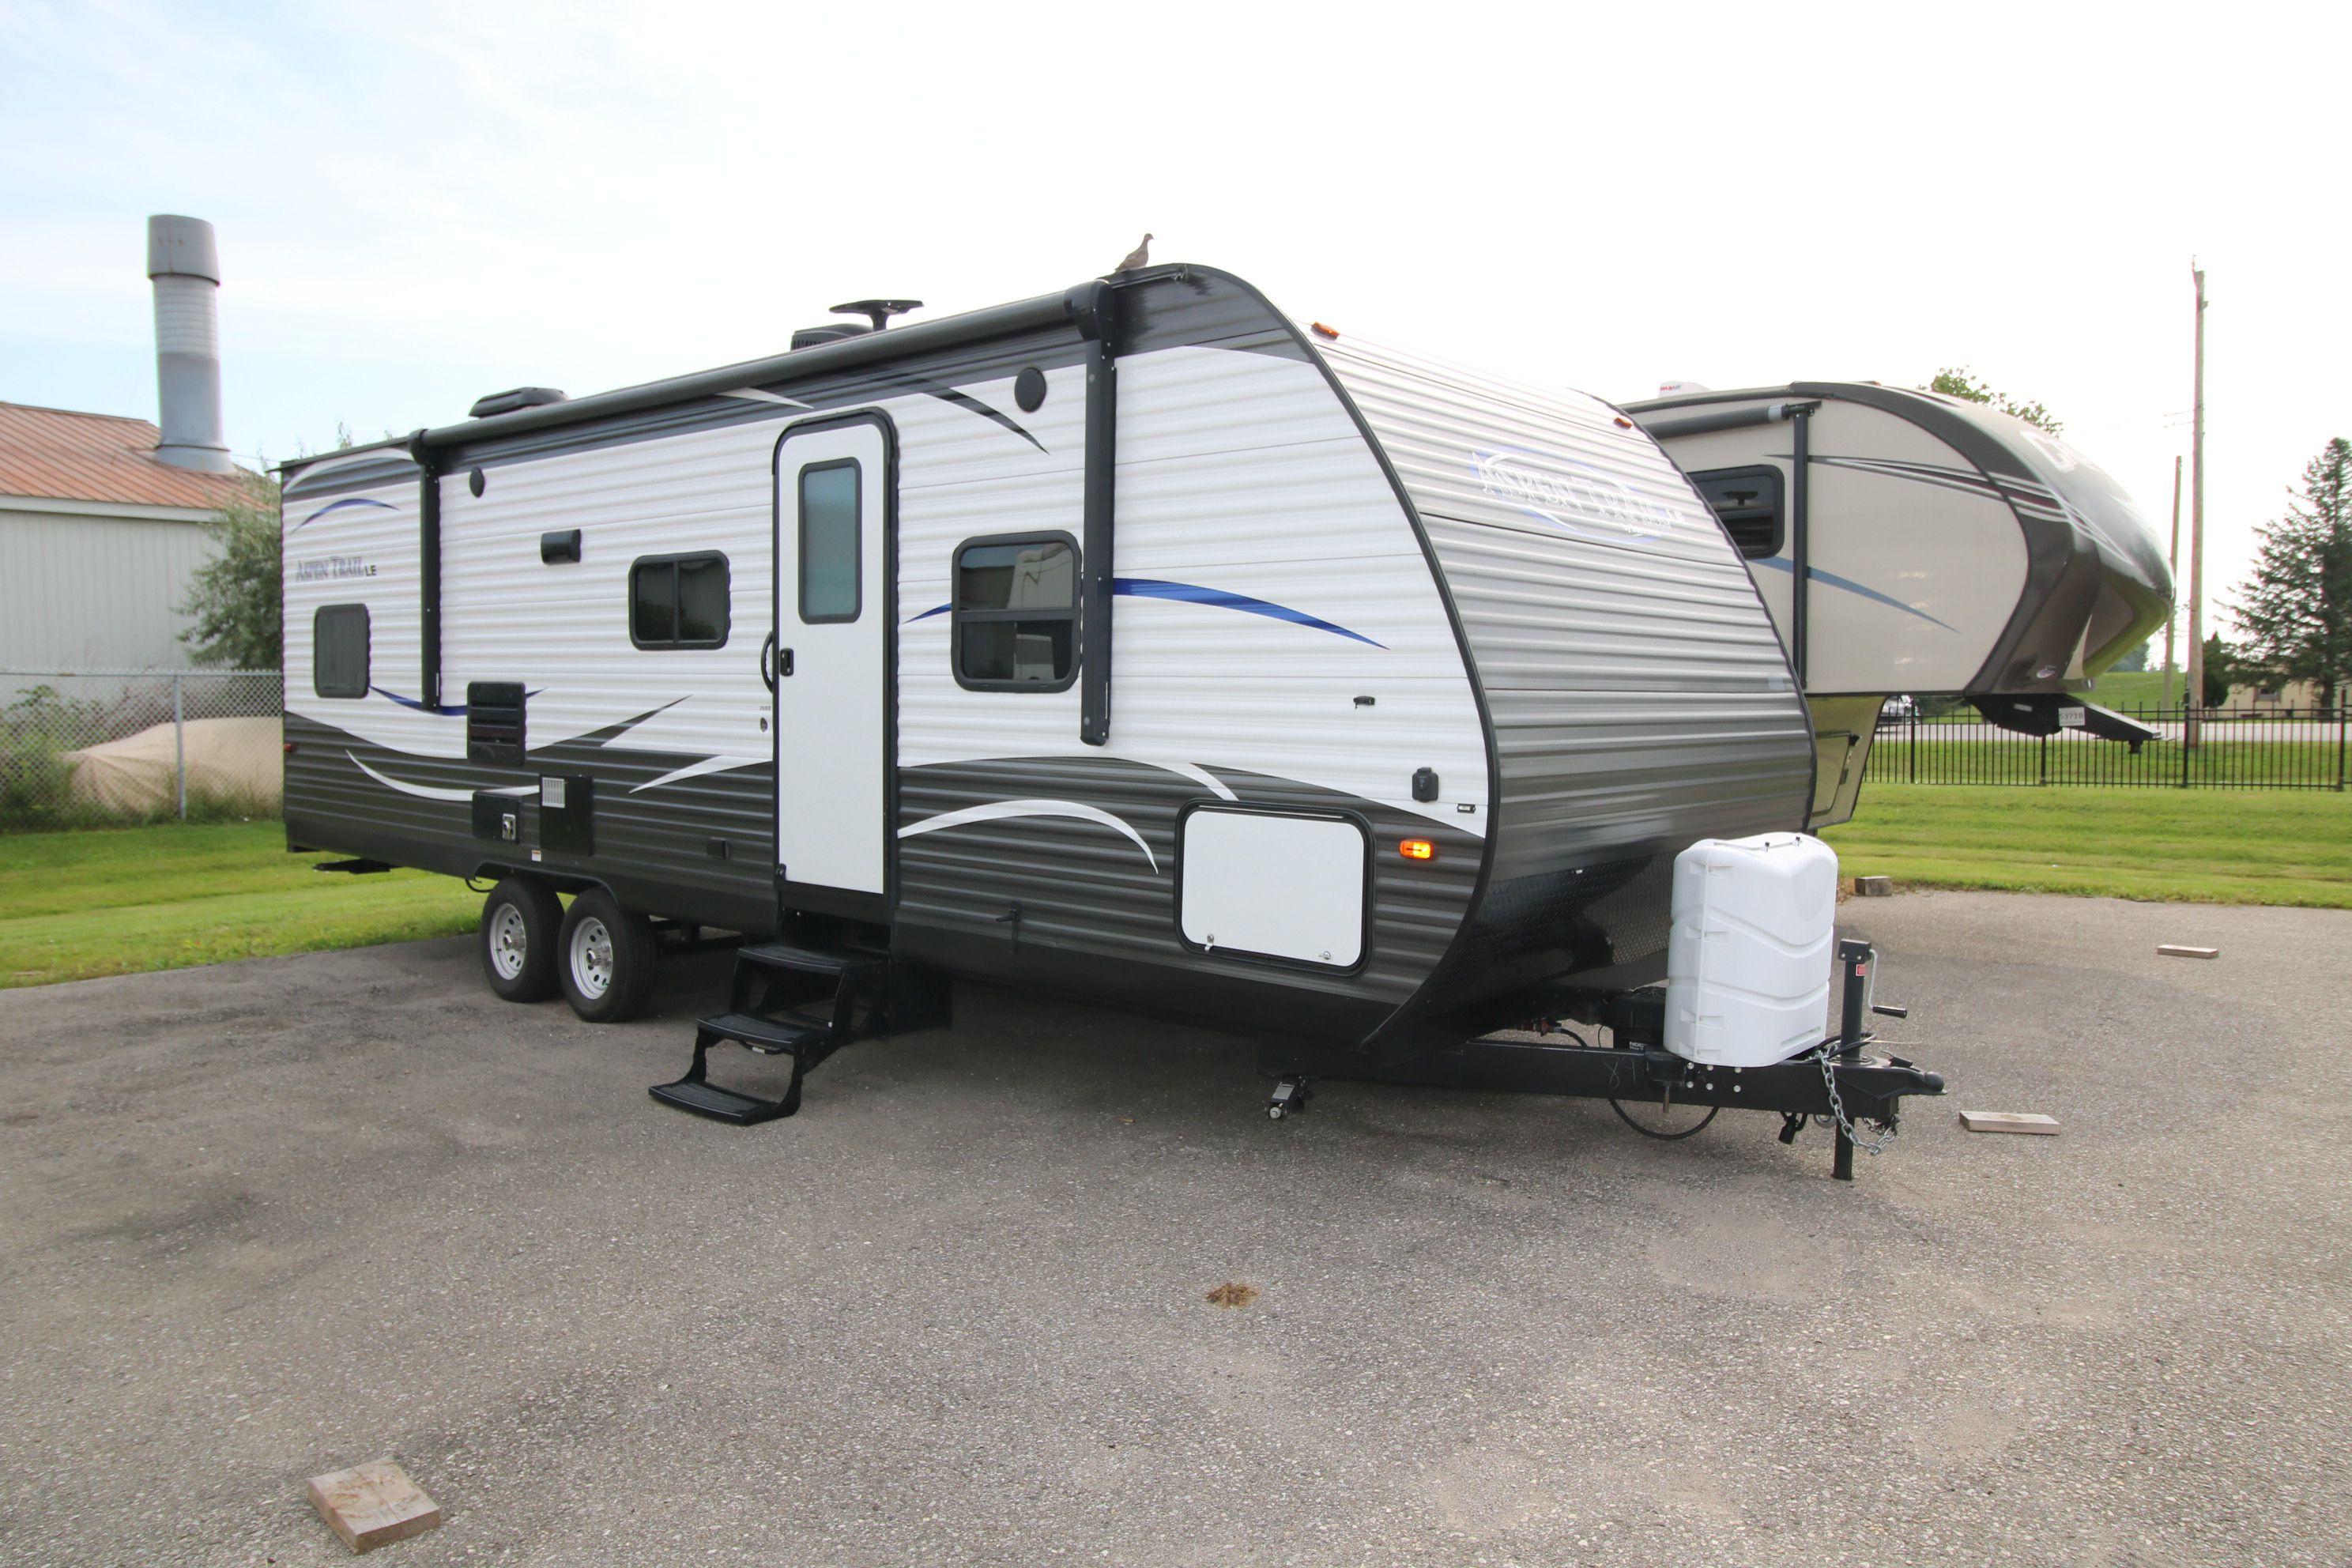 Used Aspen Travel trailers for sale - TrailersMarket.com